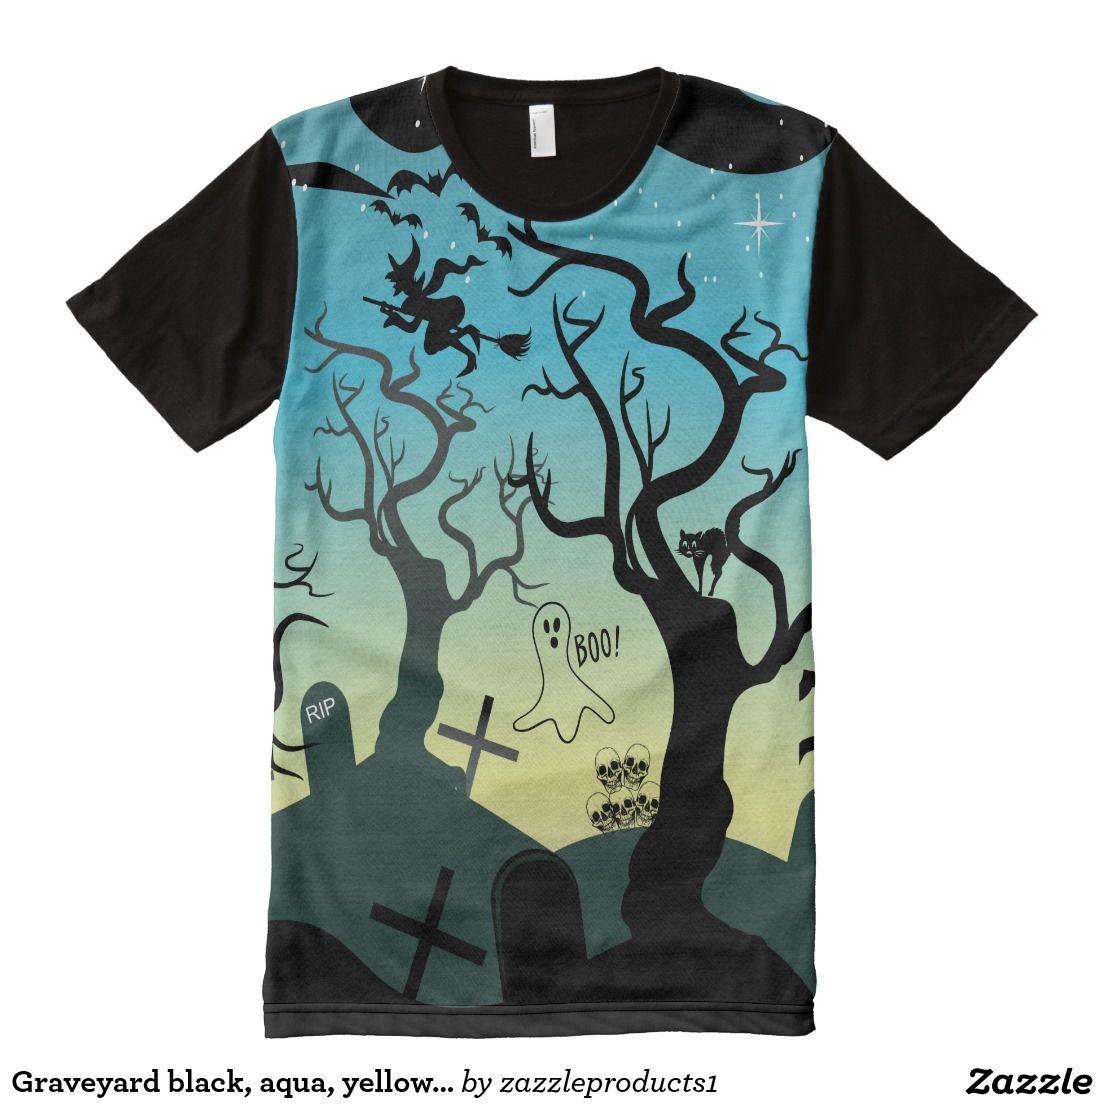 Graveyard black, aqua, yellow Halloween All-Over Print T-shirt